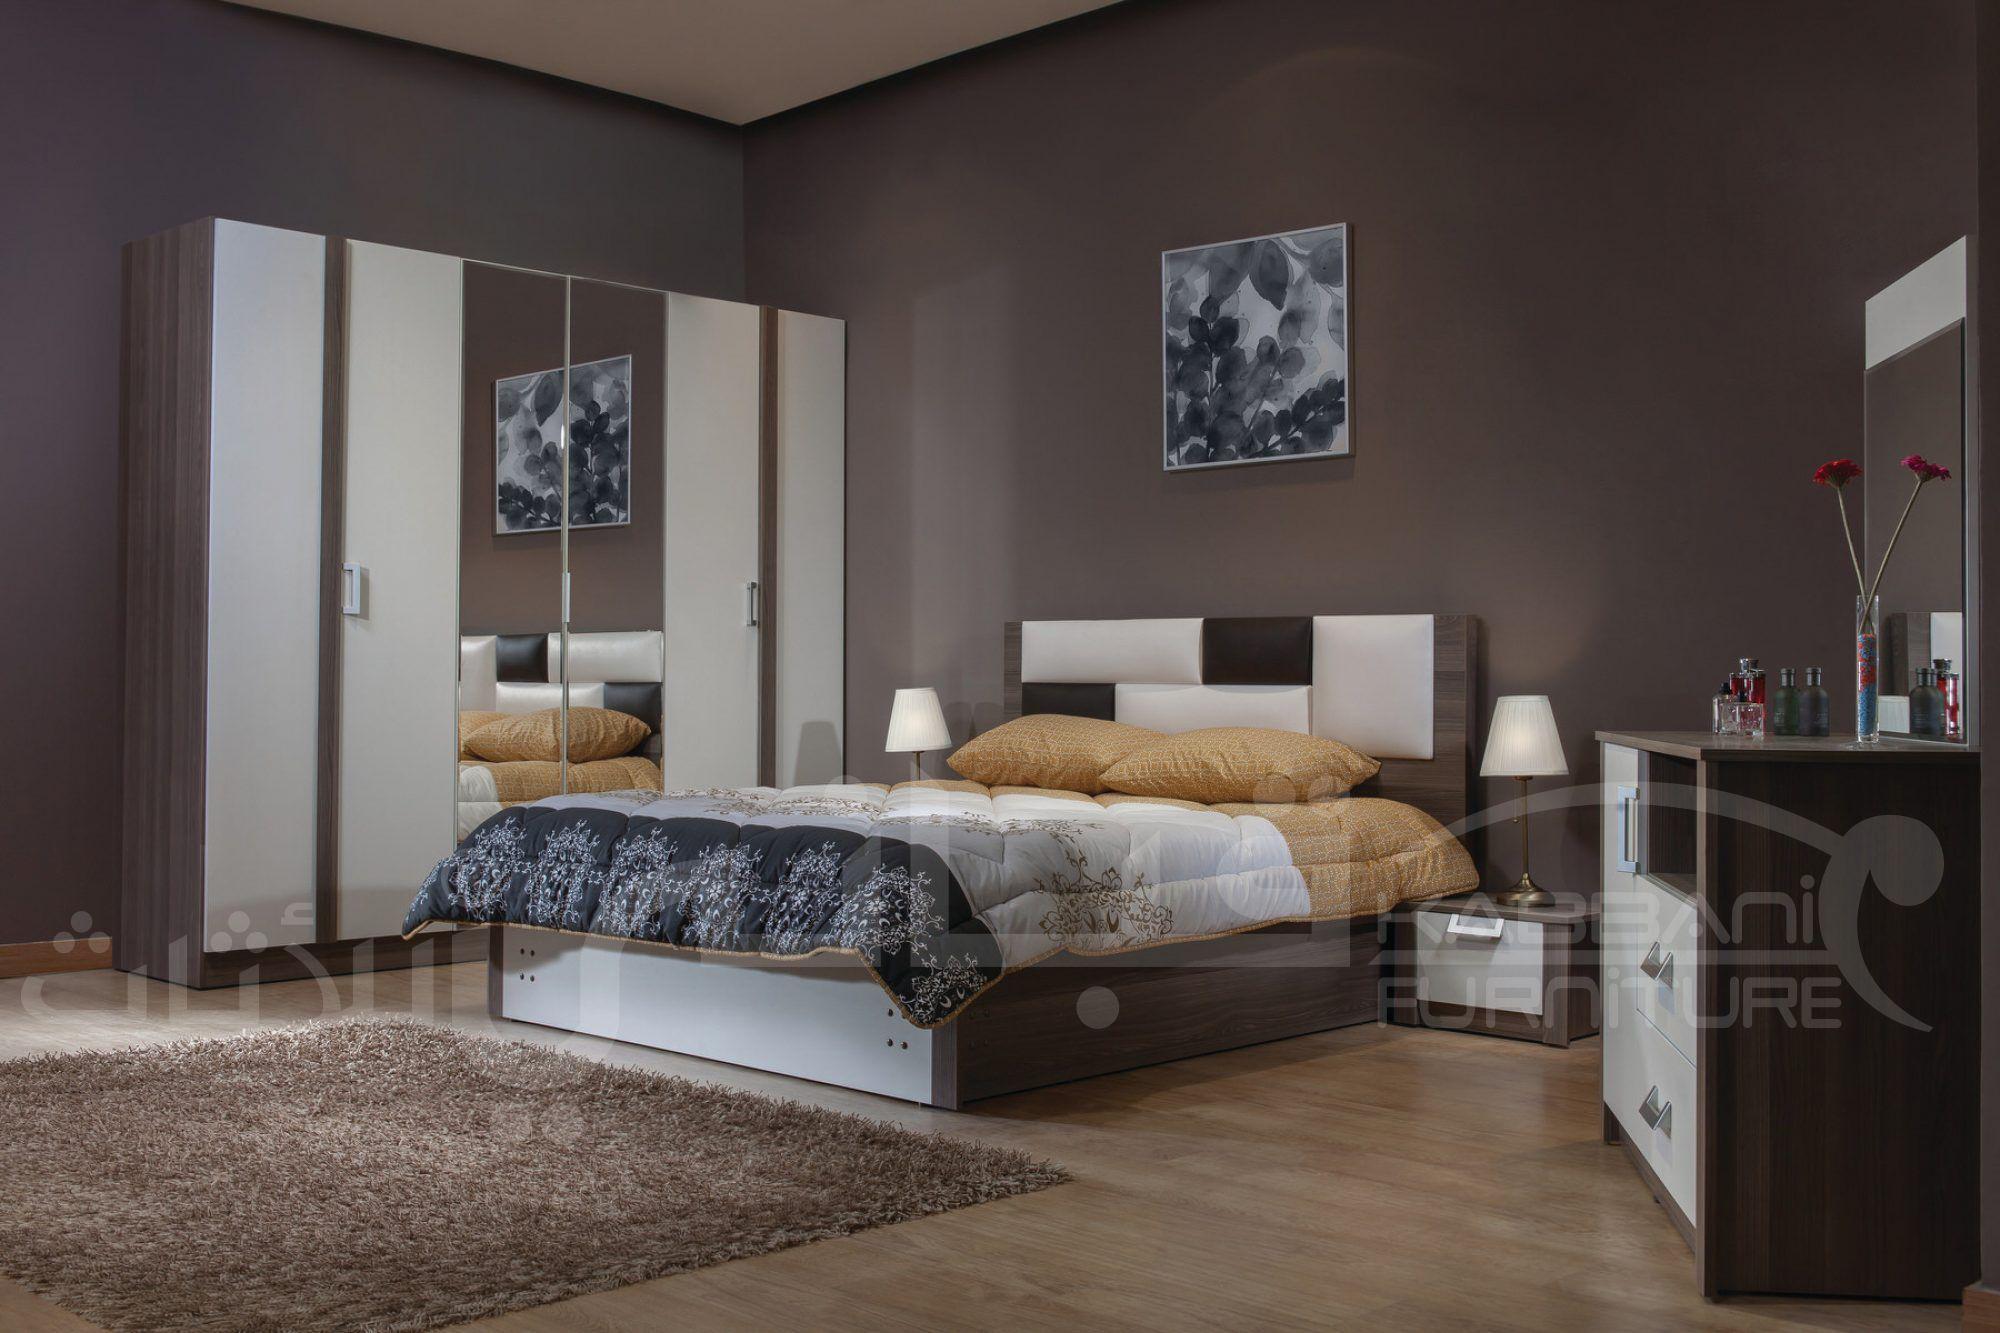 غرفة نوم أوركيد Furniture Home Home Decor